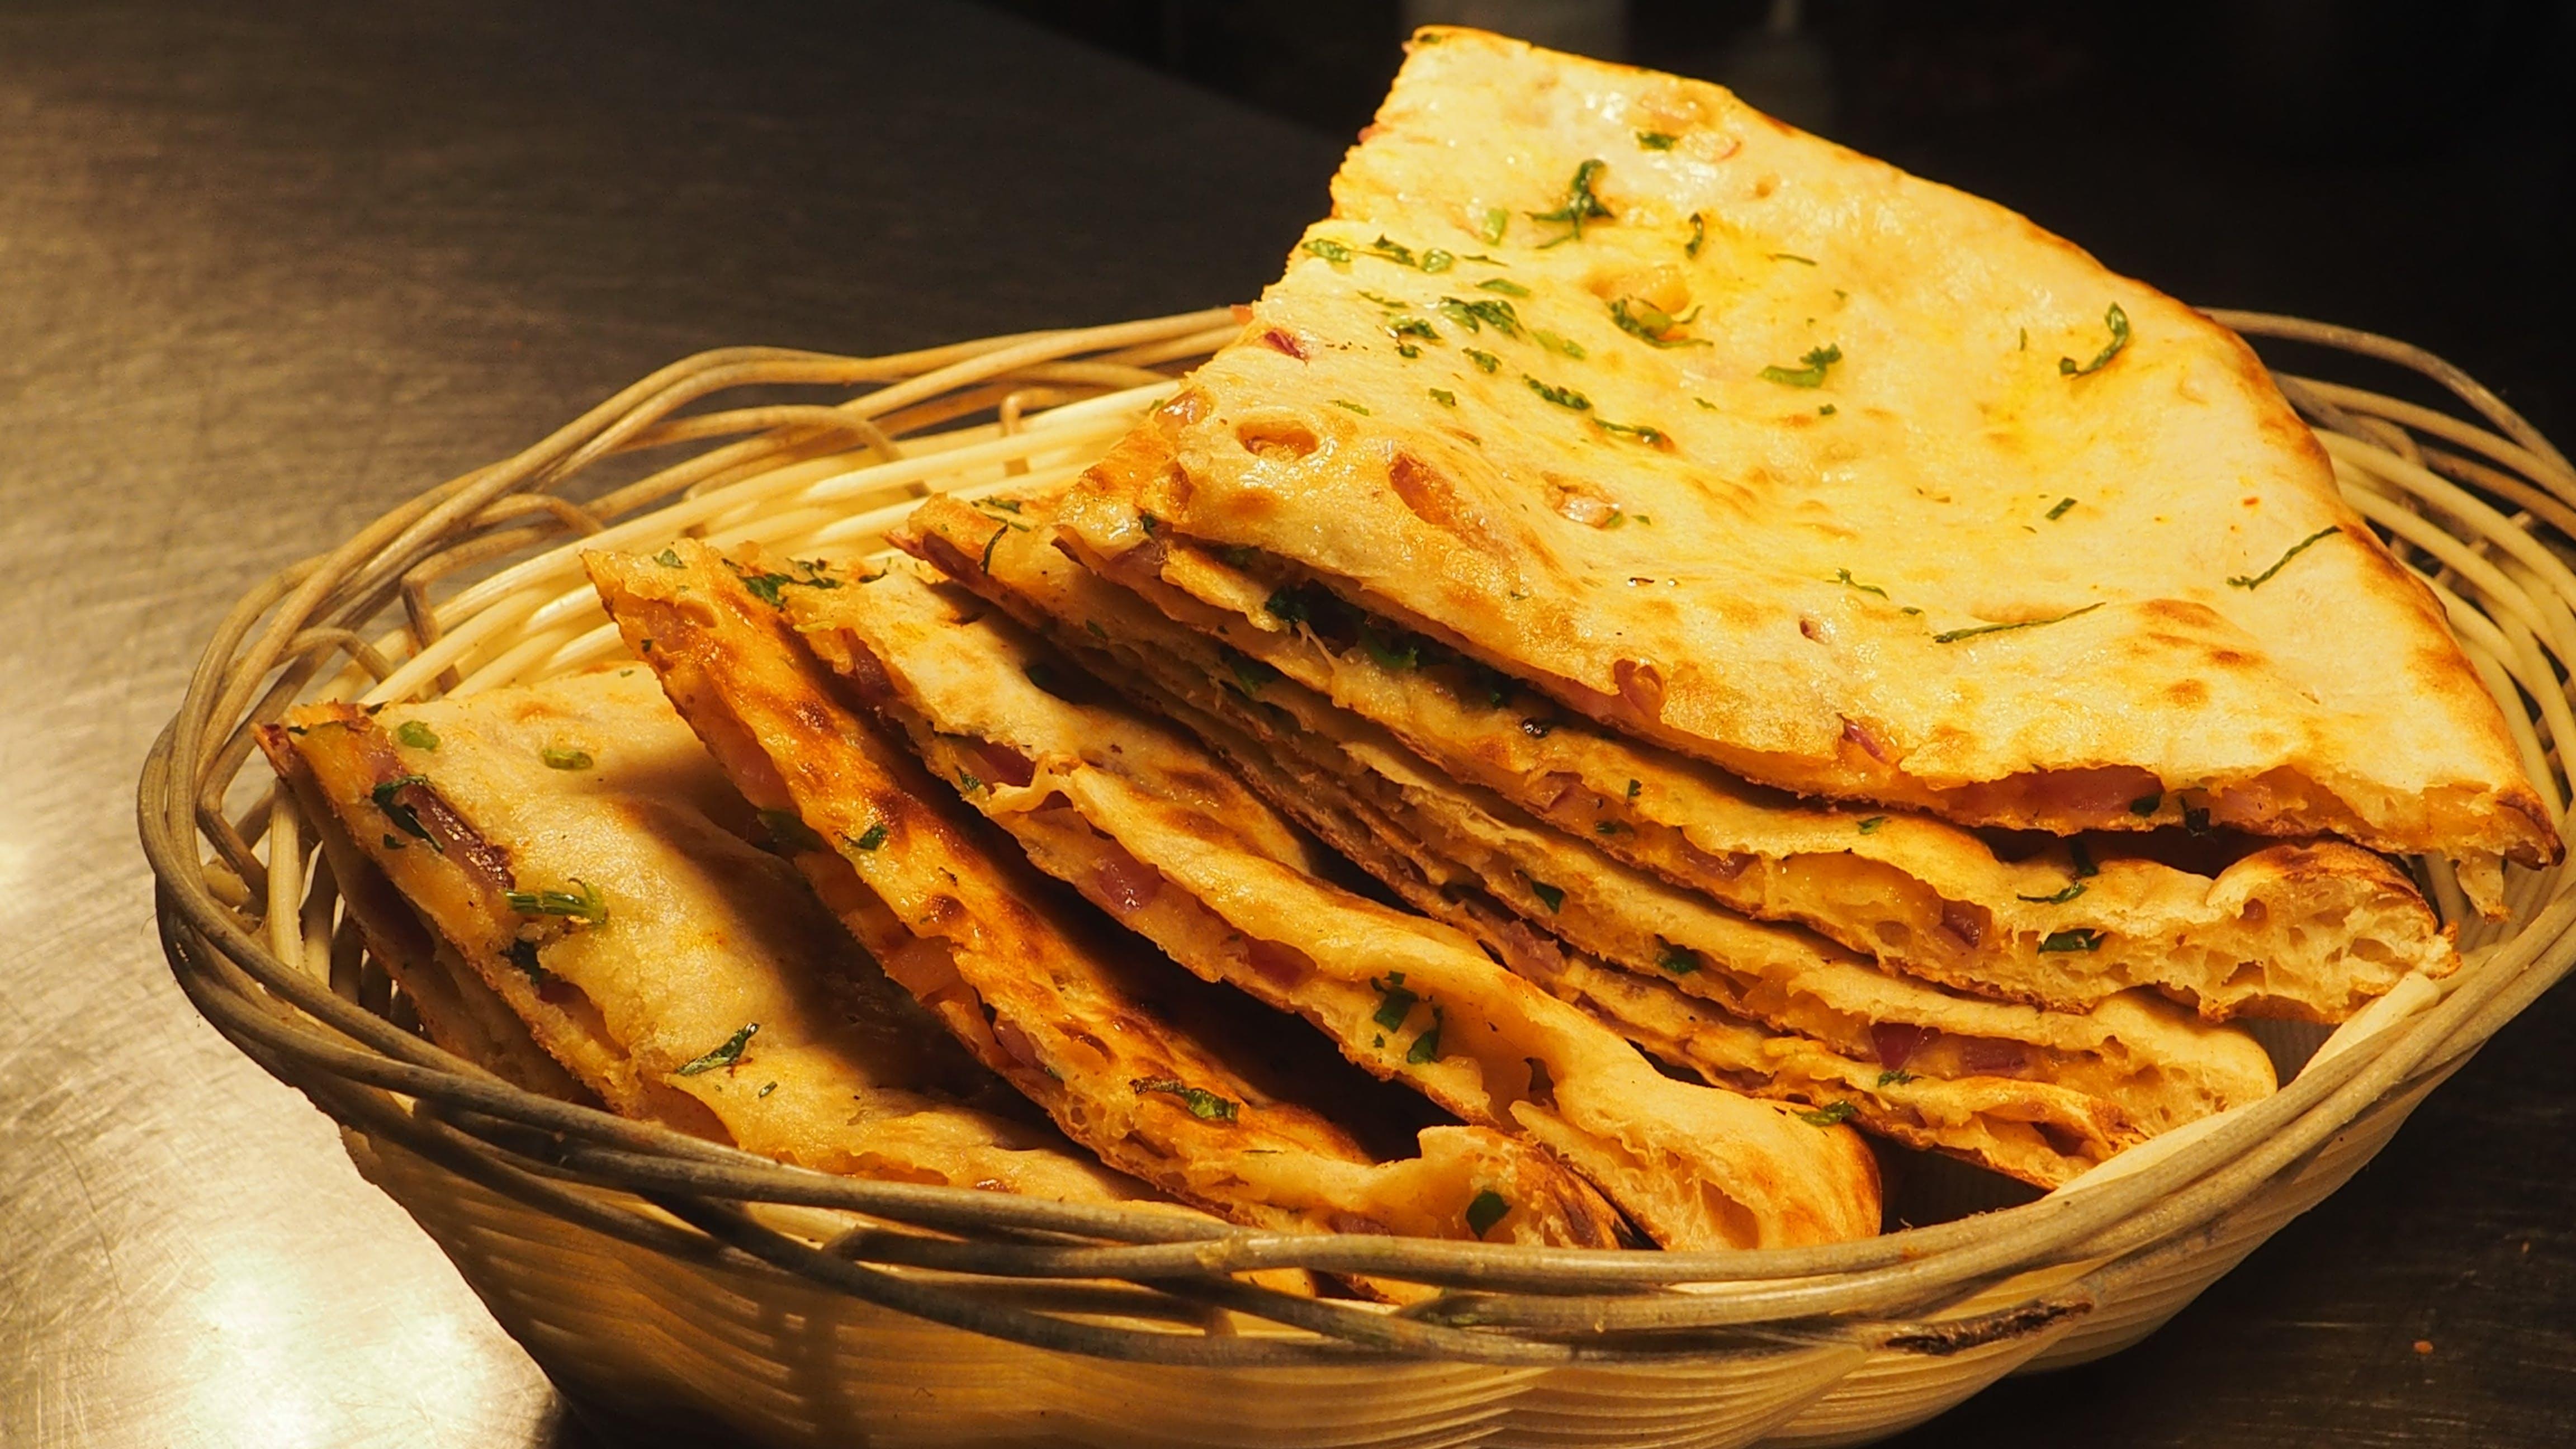 Free stock photo of naan bread, sweet naan